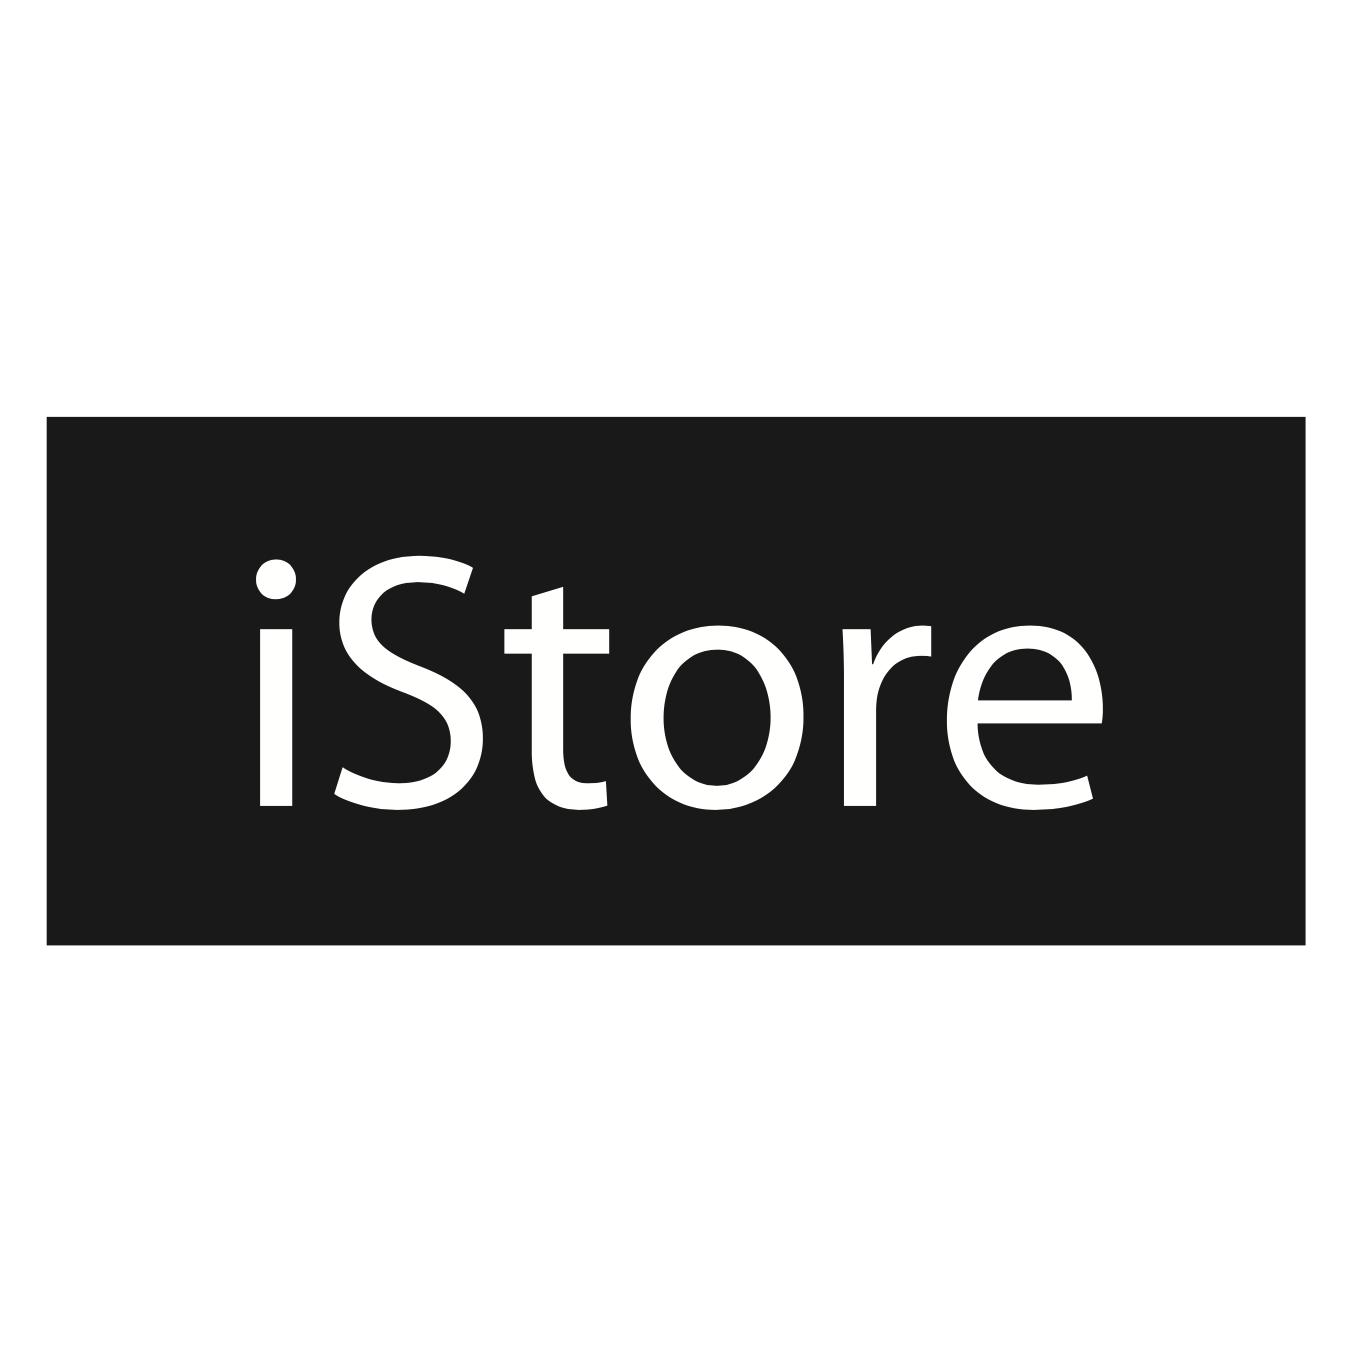 iPhone 6 Plus 128GB - Silver